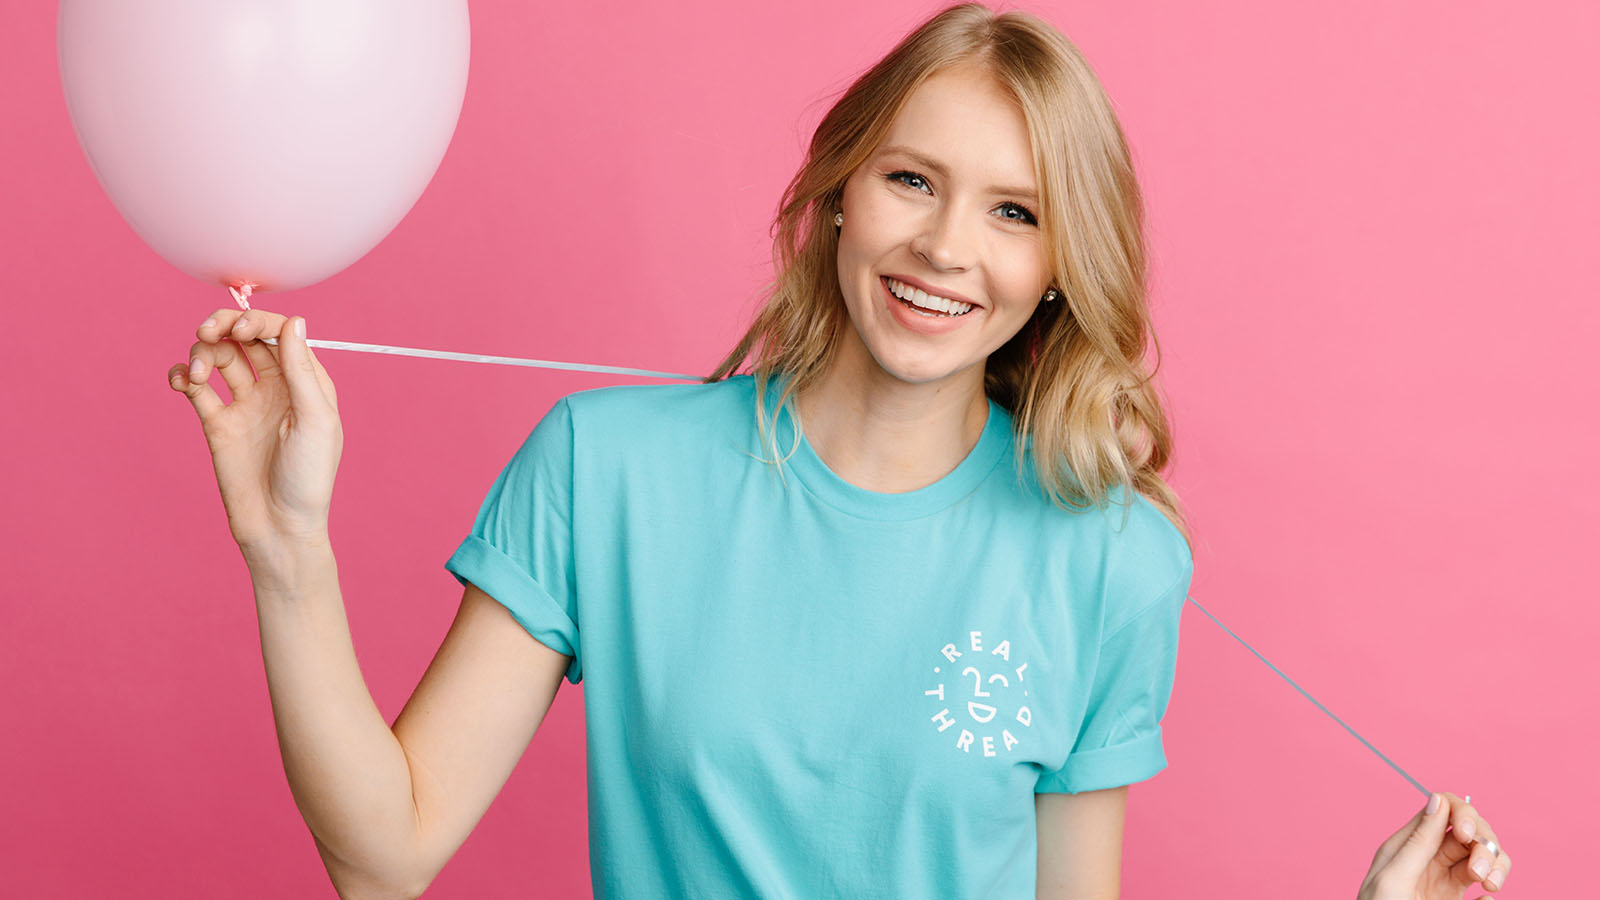 How to Create Awesome Company T-Shirts